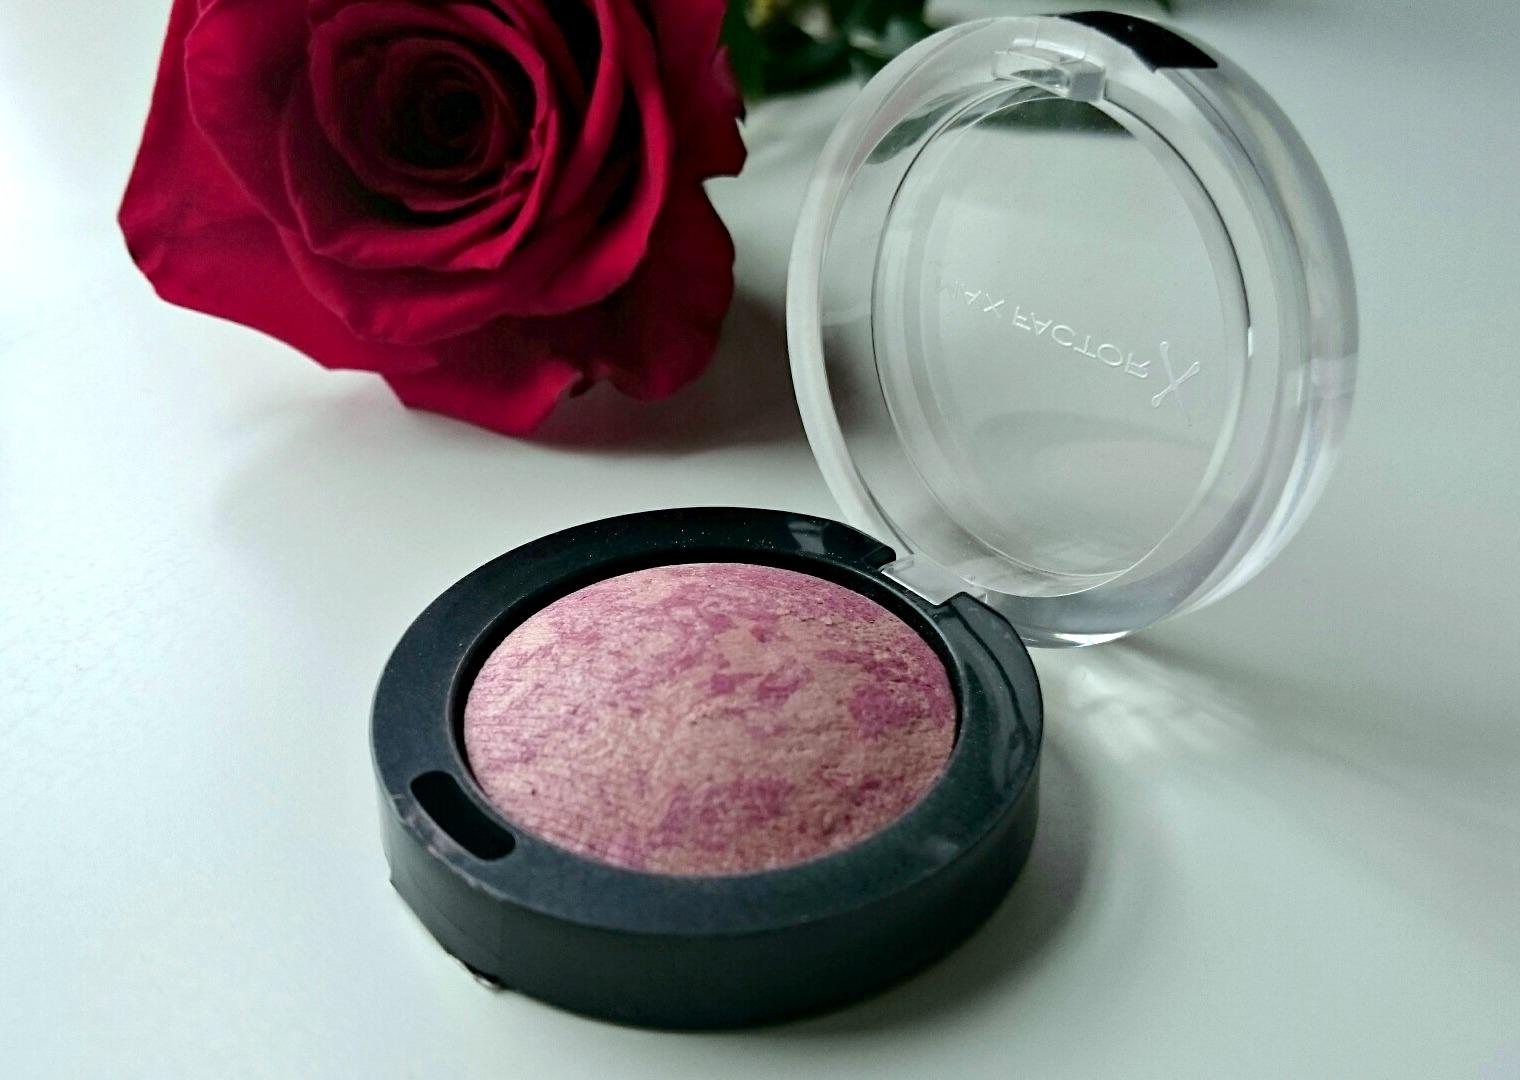 Max factor creme puff blush Seductive Pink